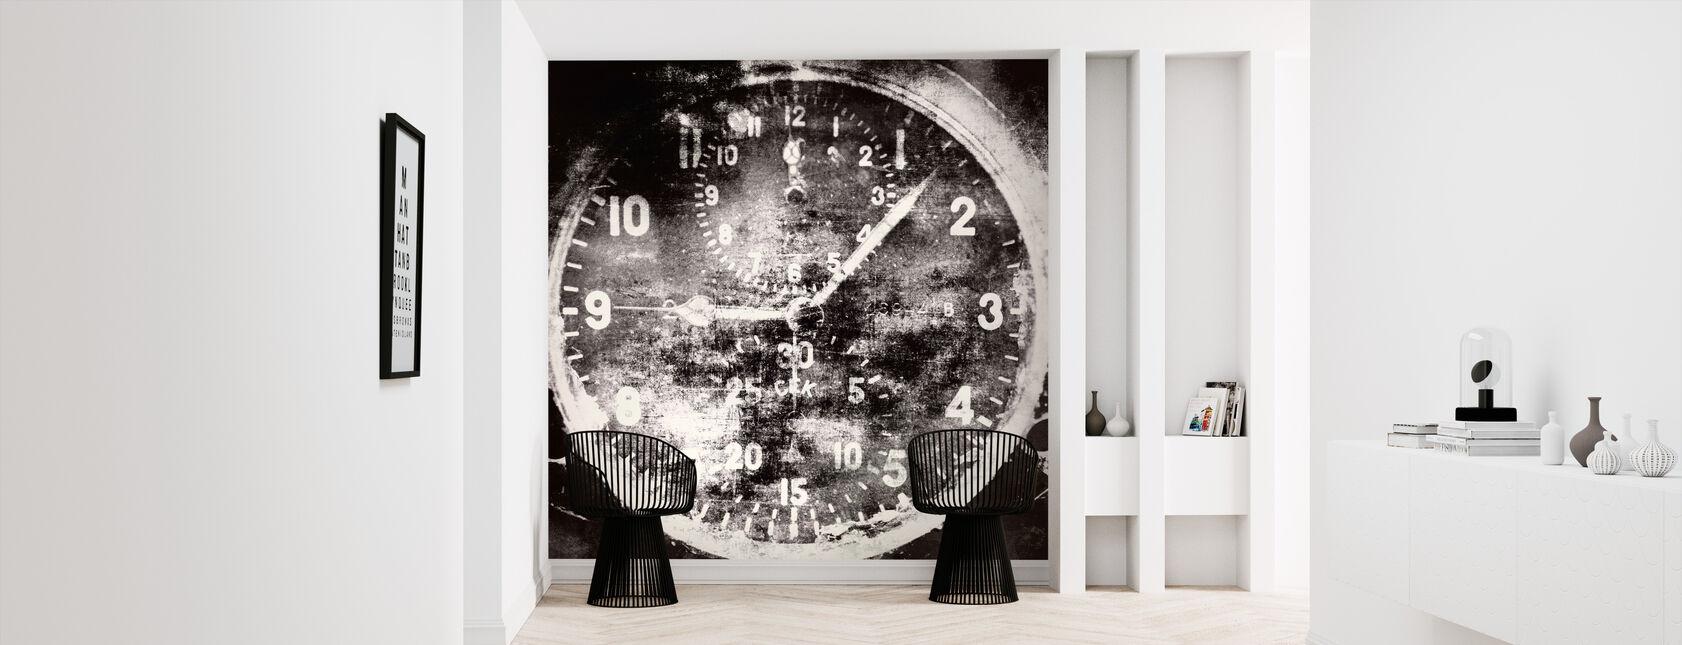 Vintage Airplane Clock - Wallpaper - Hallway